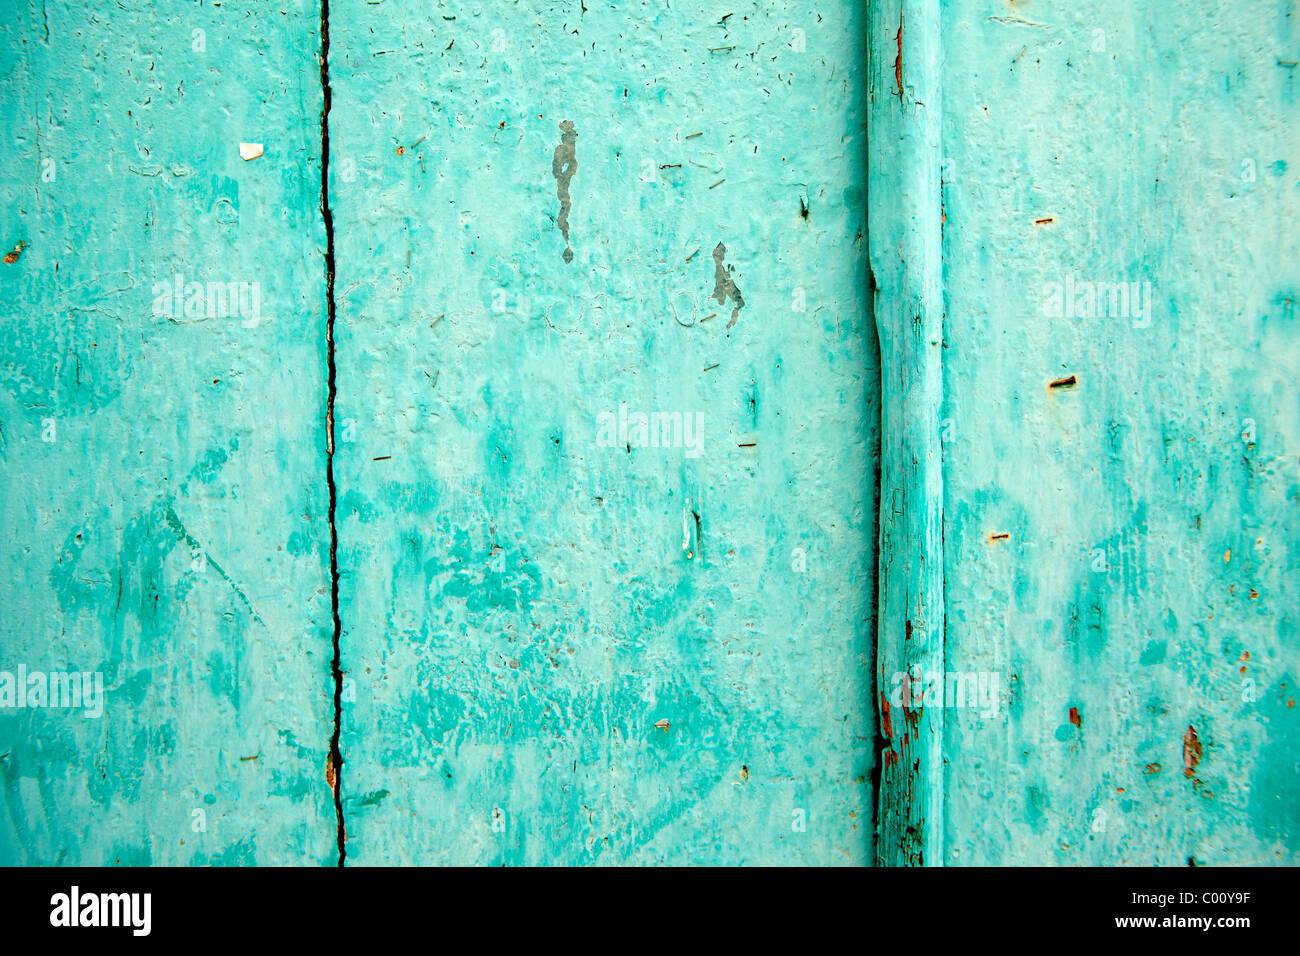 Türkis lackierte Tür Stockfoto